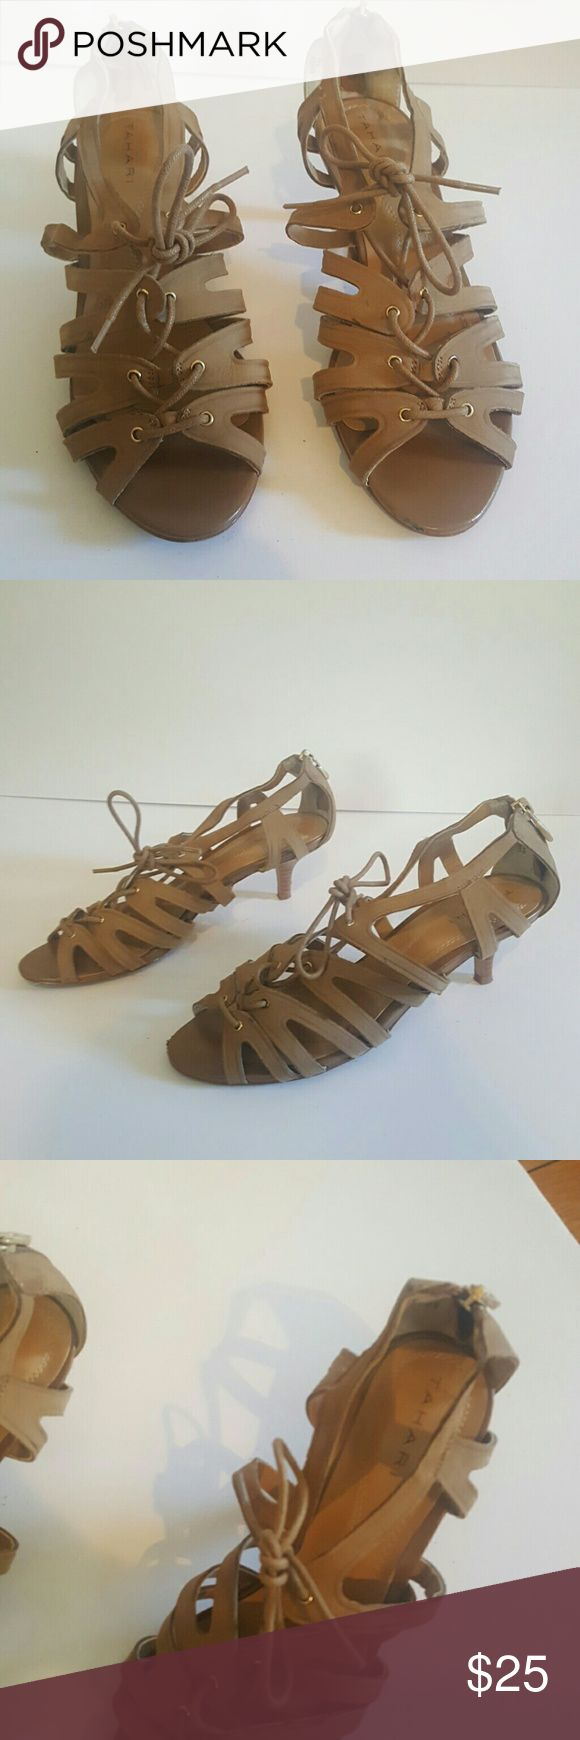 TAHARI DARA 7M WOMENS LOW HEEL SANDALS TAN TAHARI DARA SIZE 7 WOMENS SHOES STRAPPY LACE UP TIE SANDALS TAN NUBUCK GOLD ZIP BACK ZIP OPENTOE DRESS OR CASUAL Tahari Shoes Sandals